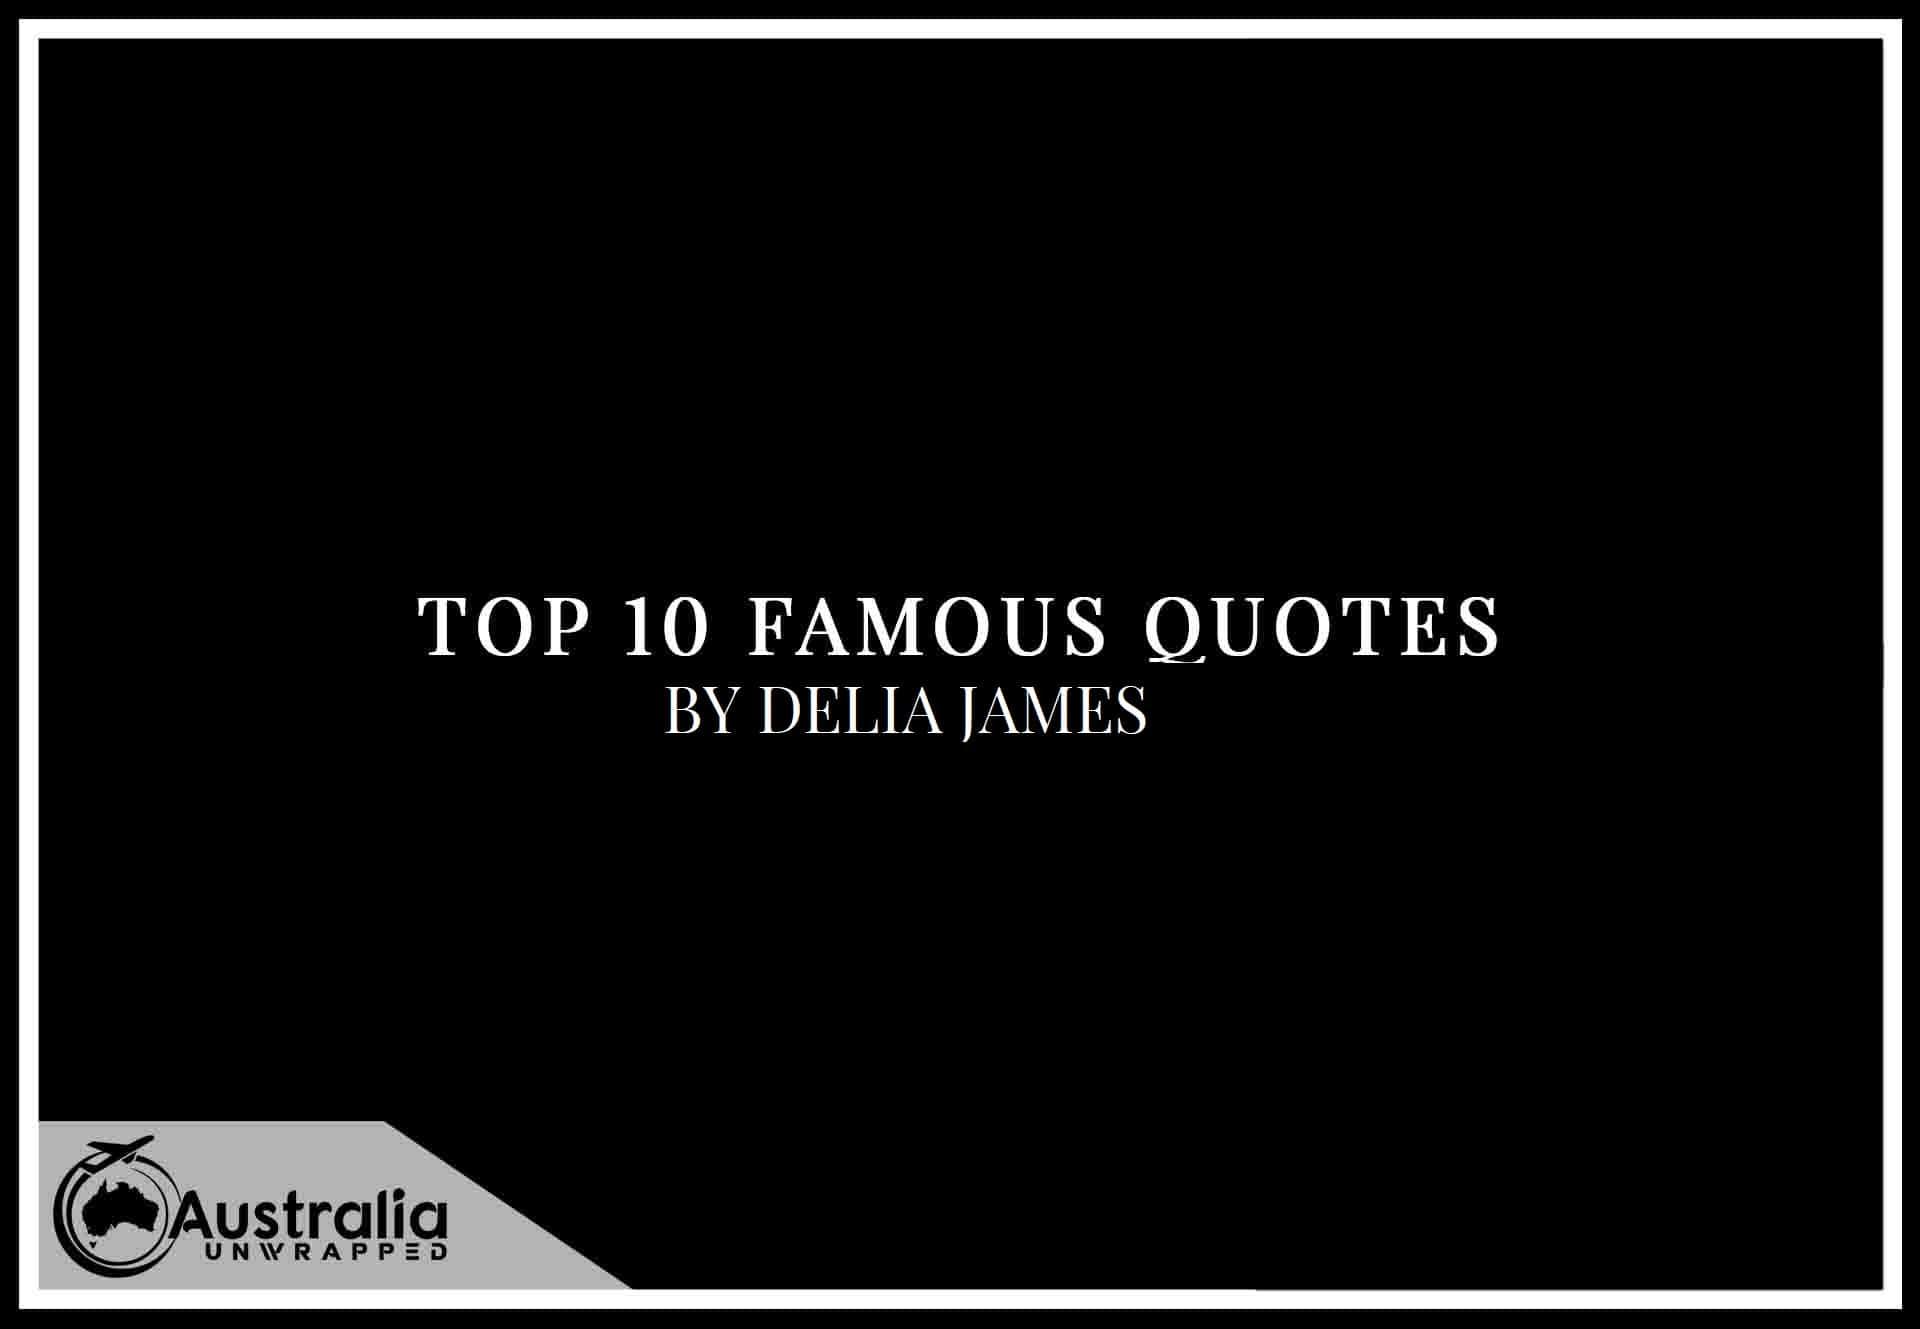 Top 10 Famous Quotes by Author Delia James